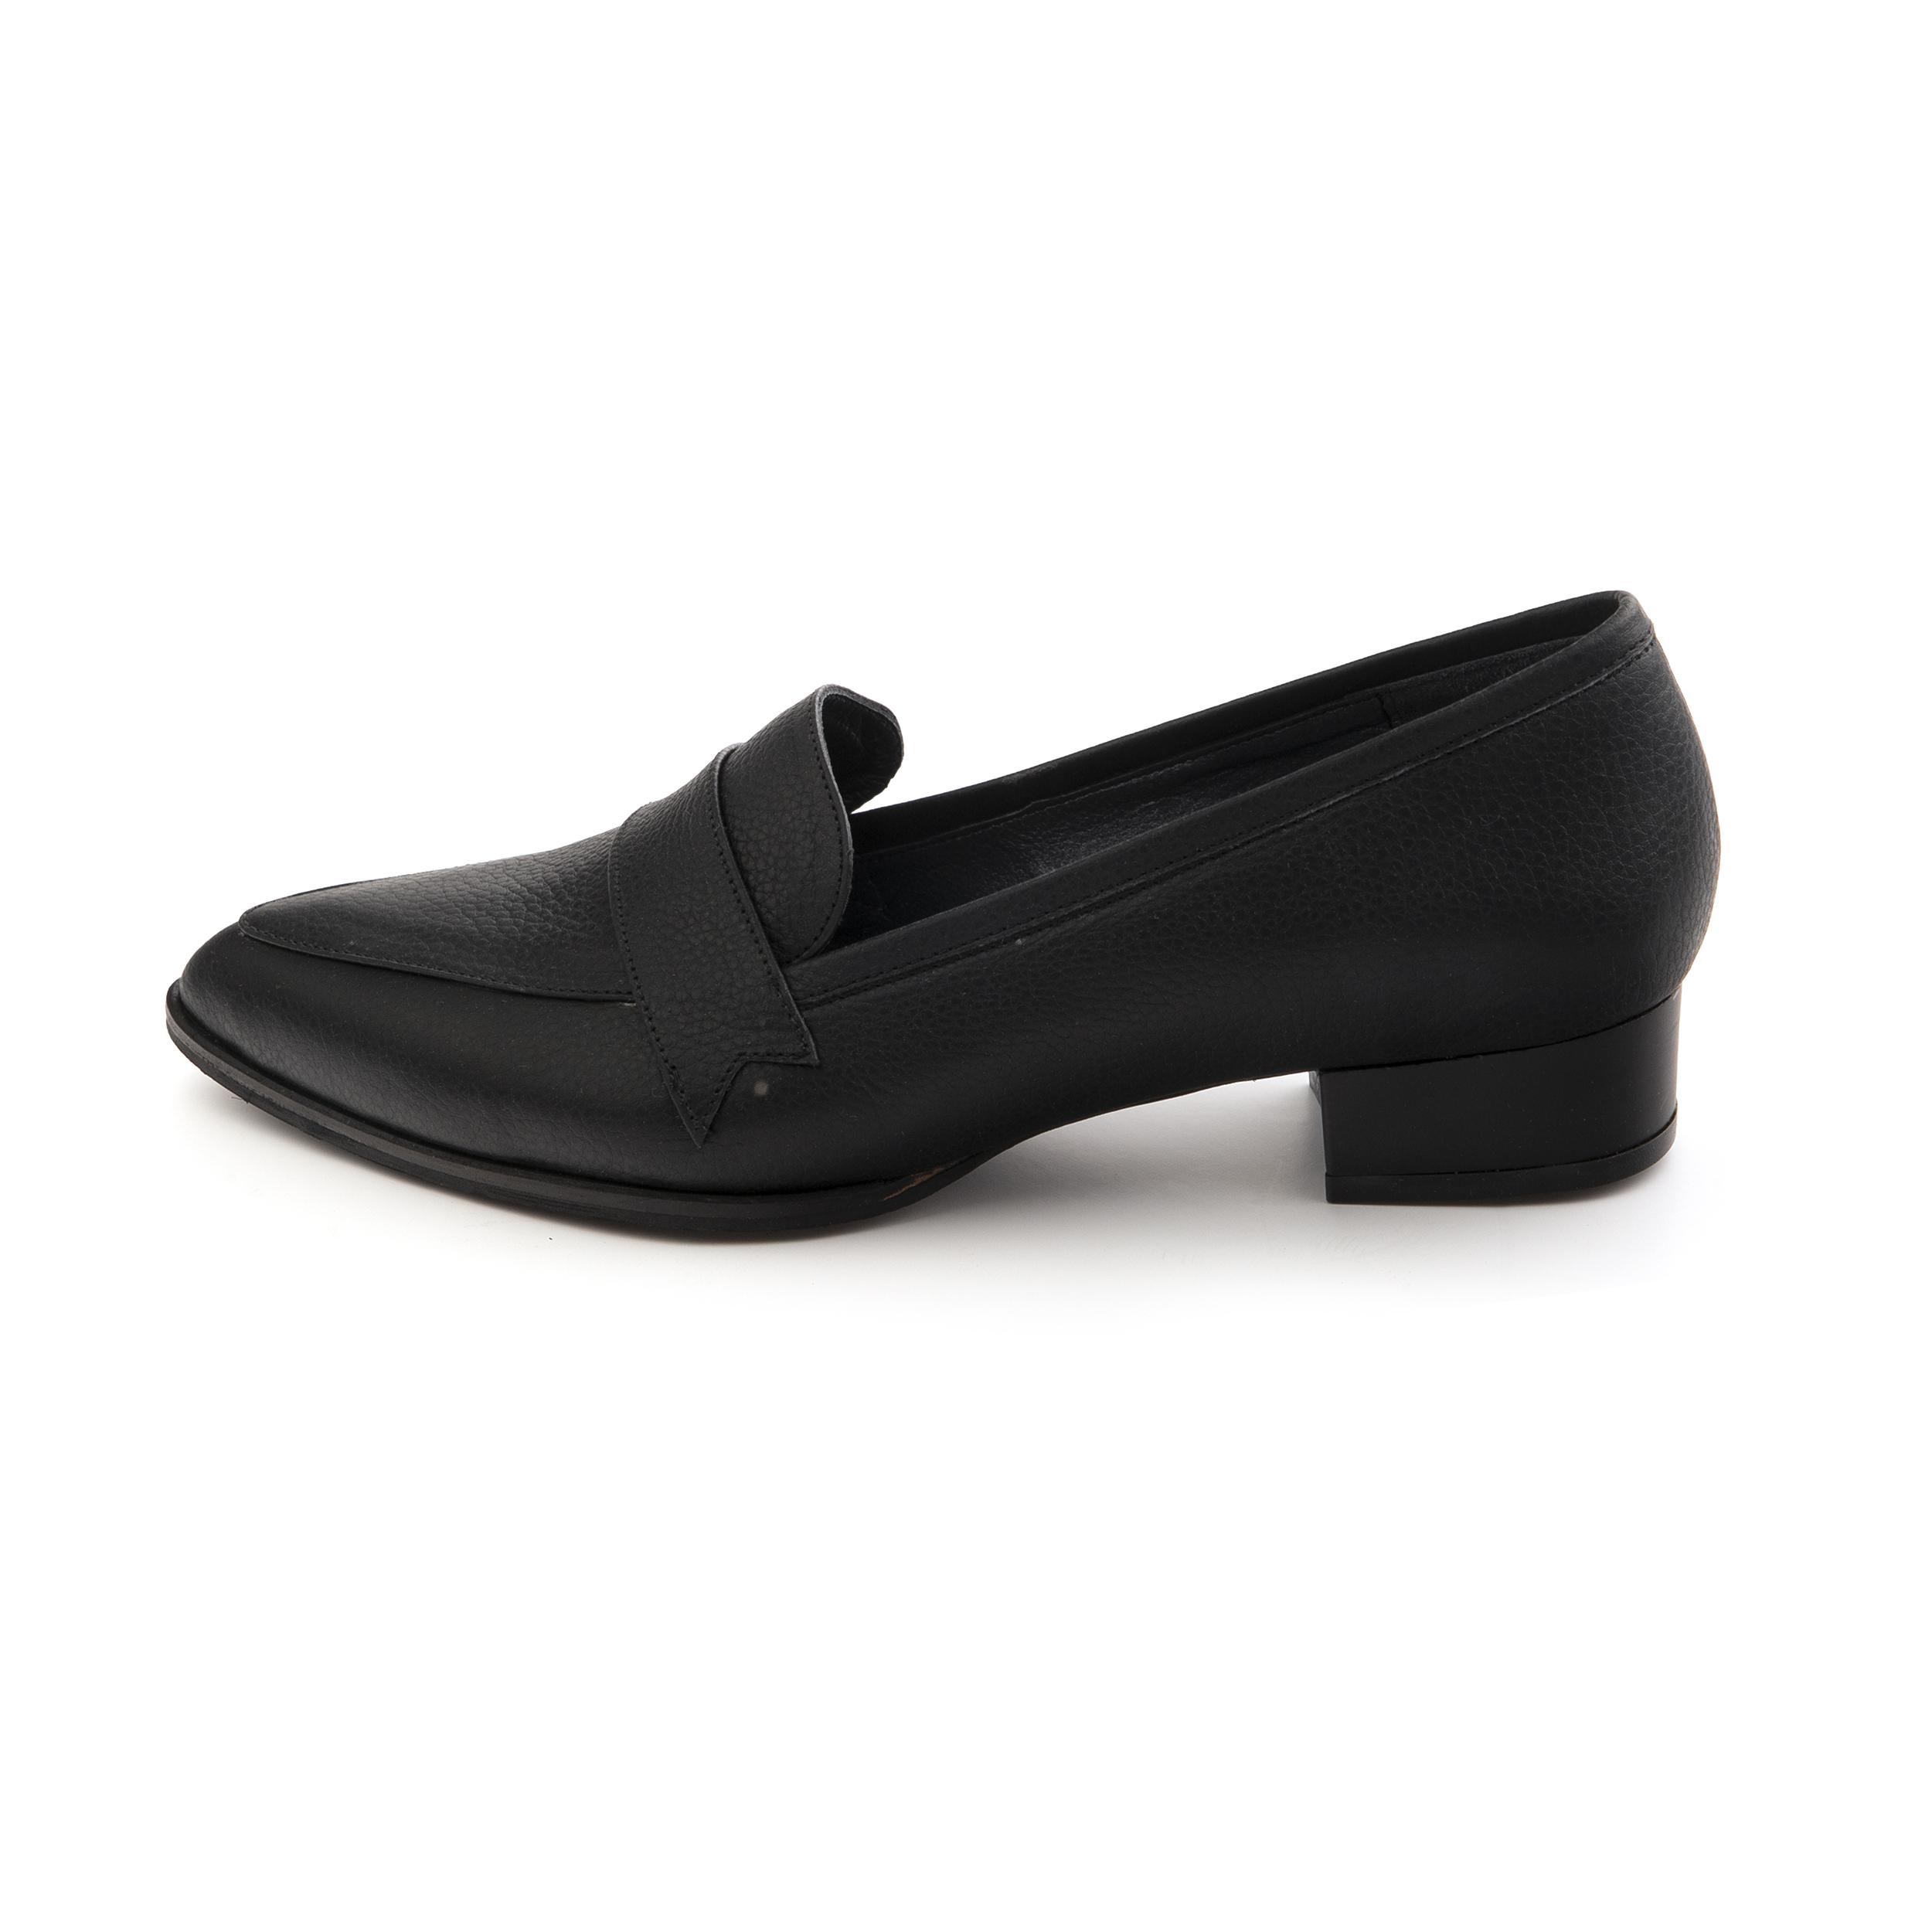 کفش زنانه مارال چرم مدل سنتیا hs